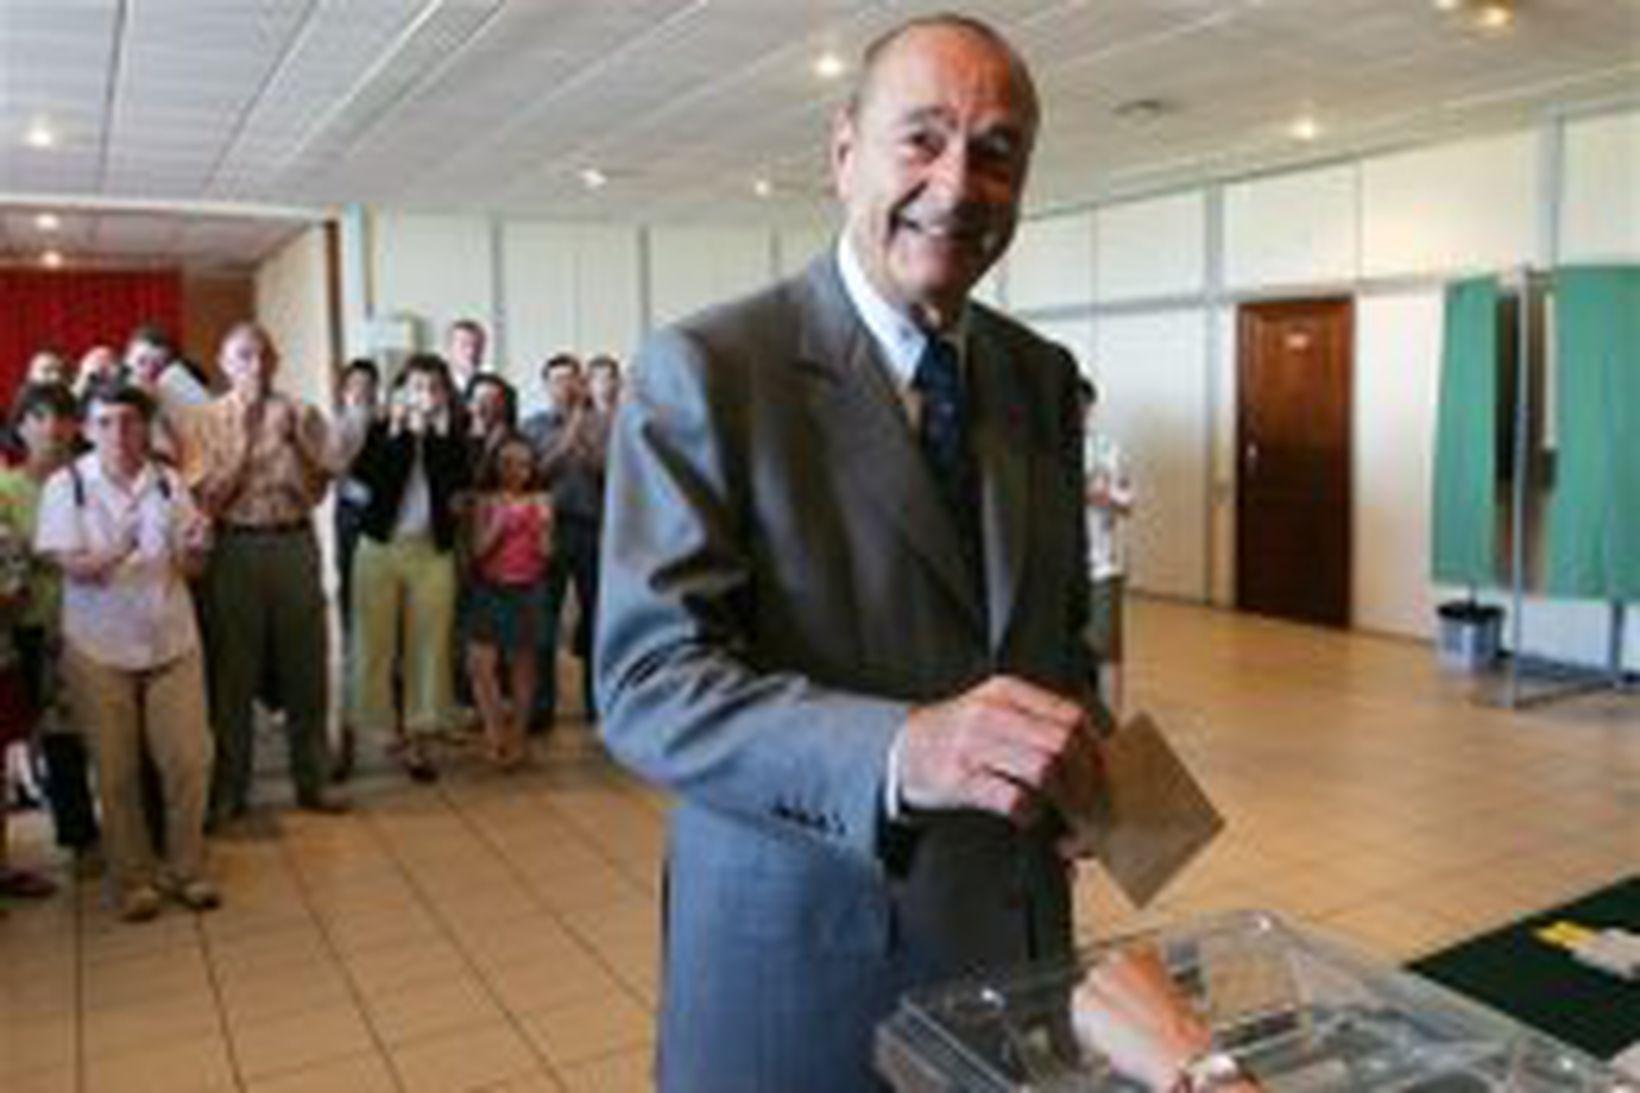 Jacques Chirac forseti og eiginkona hans Bernadette Chirac kusu snemma …